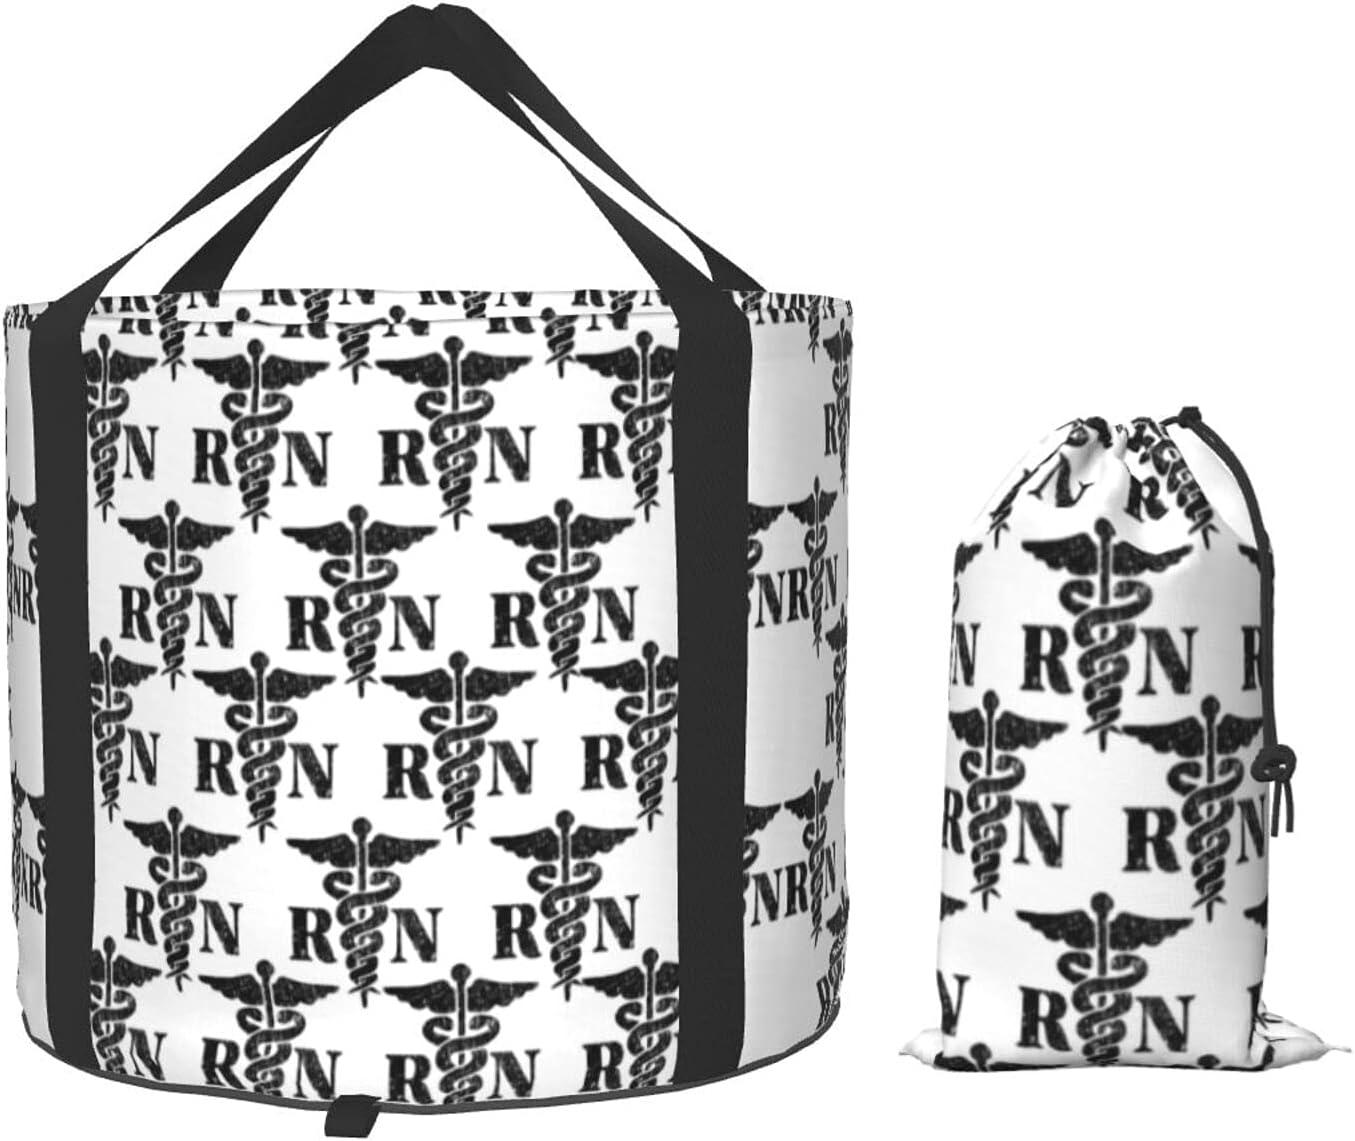 Multifunctional Portable Collapsible Bucket Dealing full 5 popular price reduction EMT Nurse Rn Folding